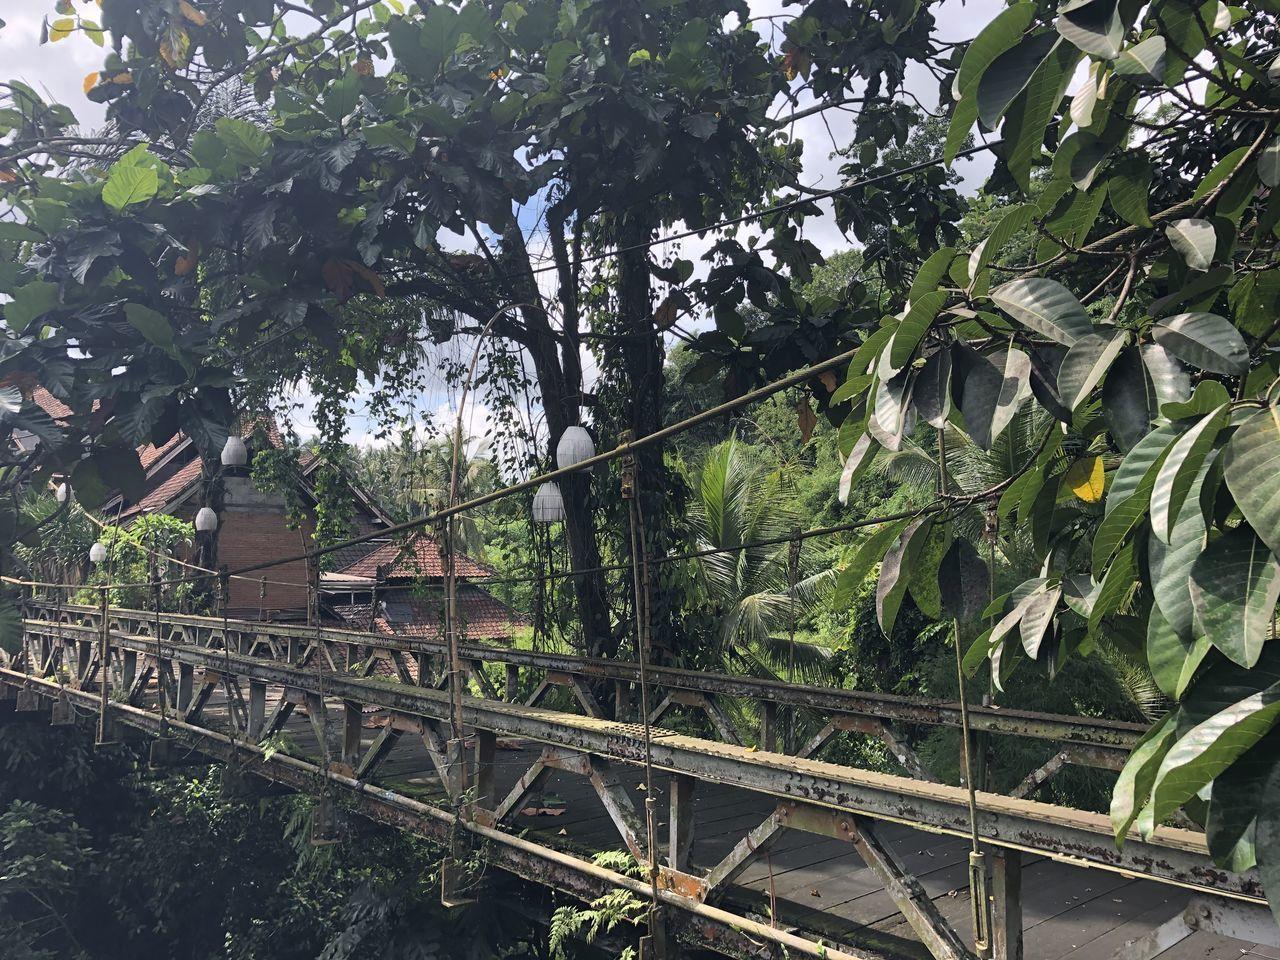 LOW ANGLE VIEW OF BRIDGE AMIDST PLANTS